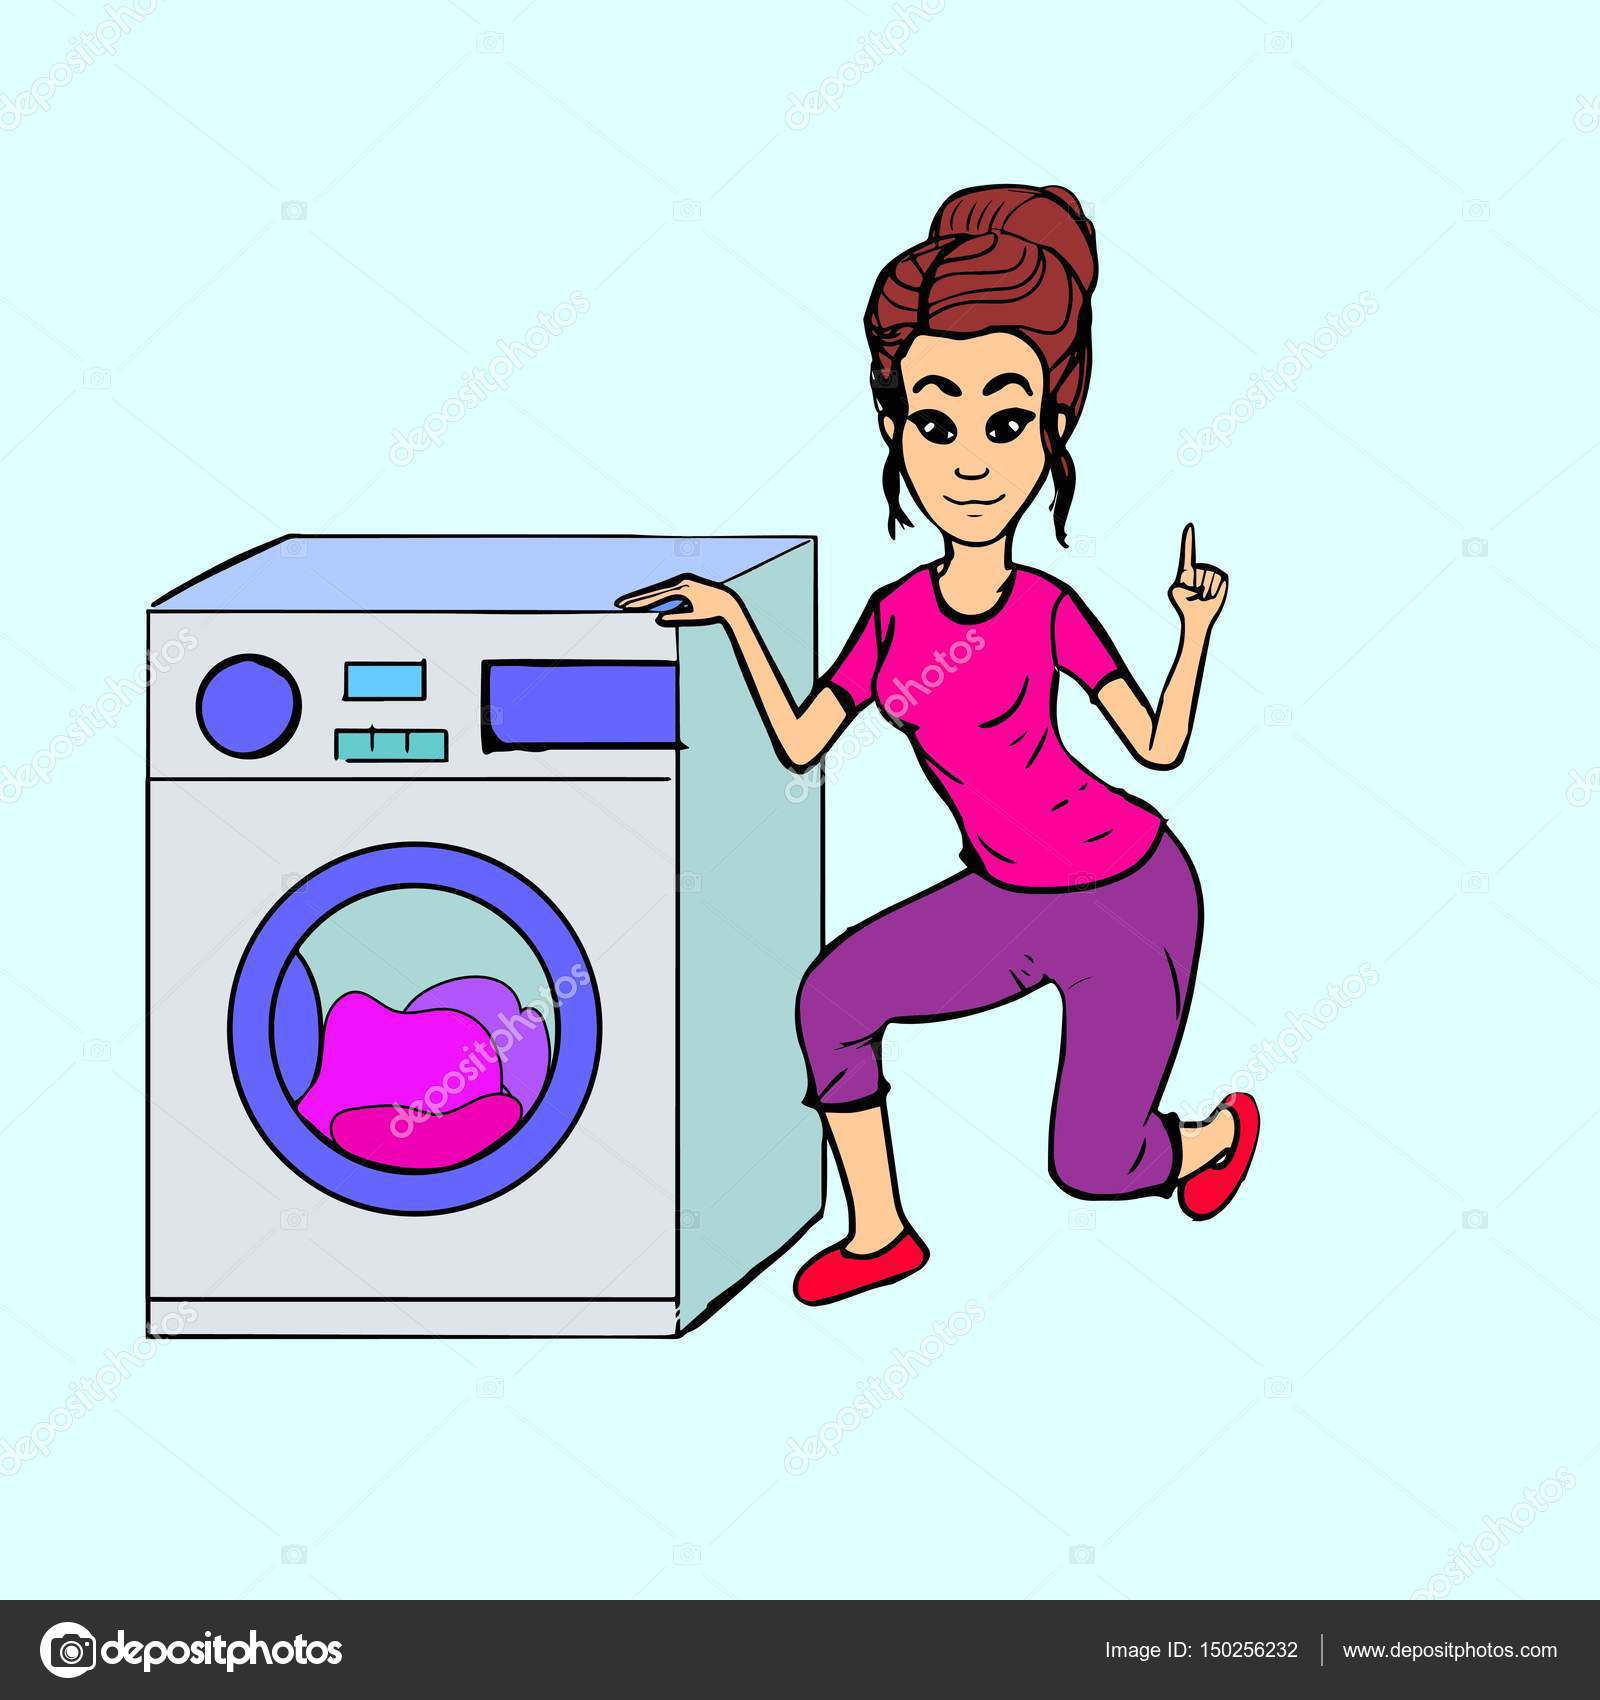 Sick clipart washing machine Alla333tre@ya raised laundry index by